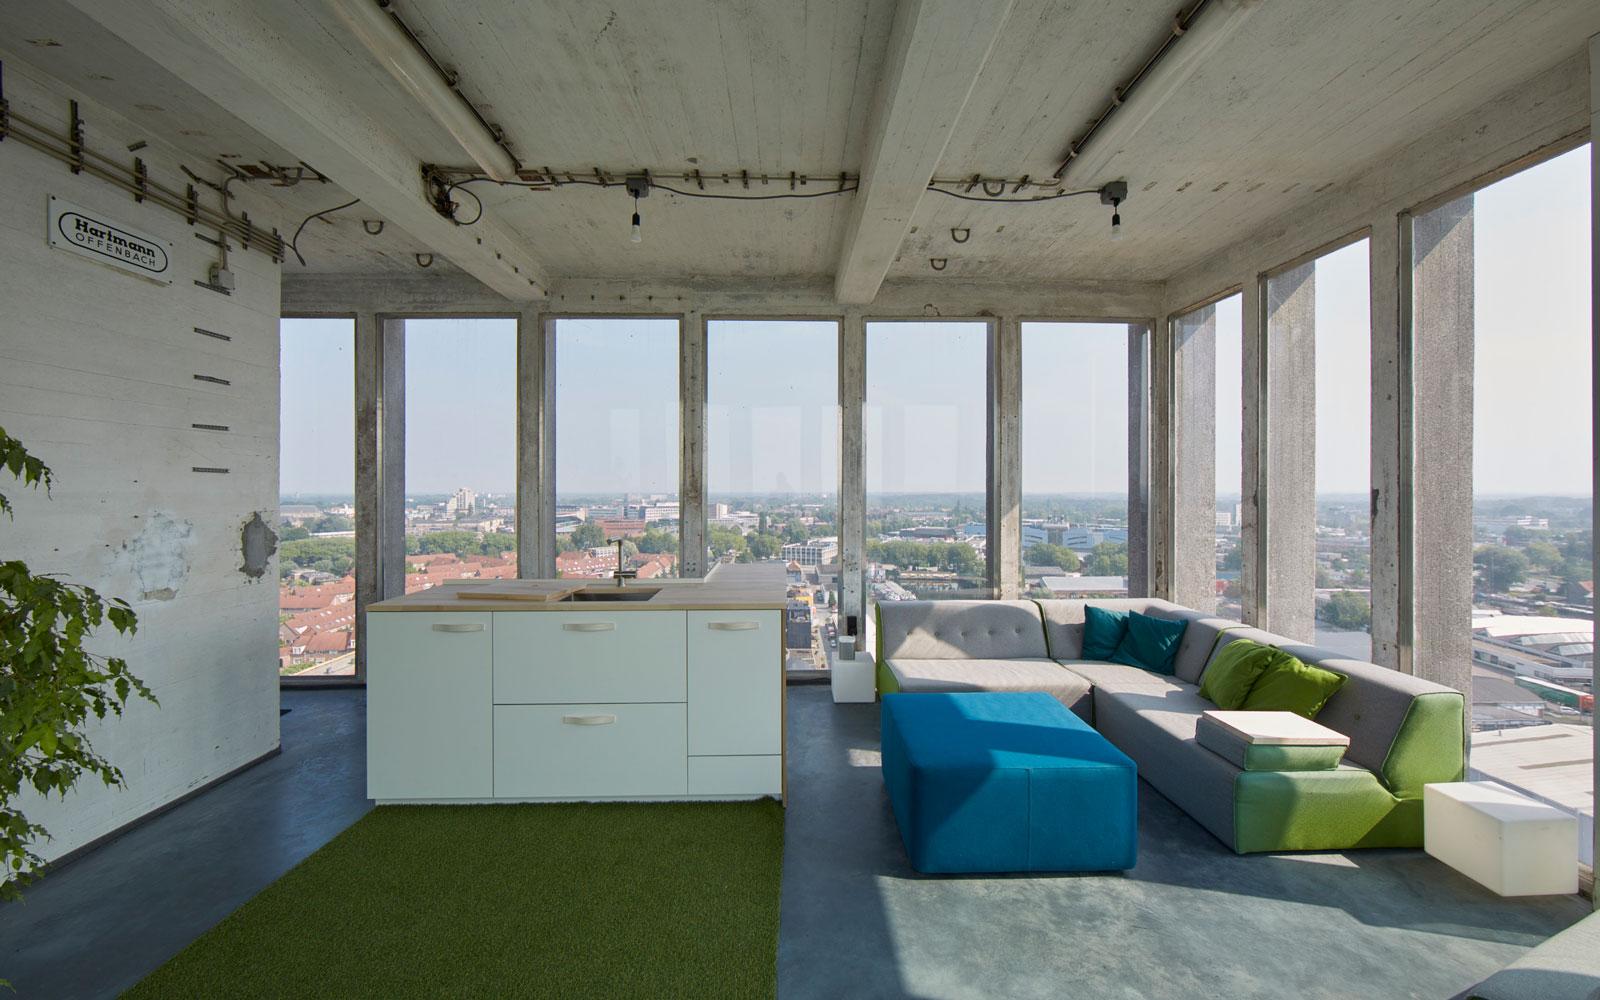 Sfeerbeton, beton vloer, keuken, industrieel, interieur, The Art of Living Online